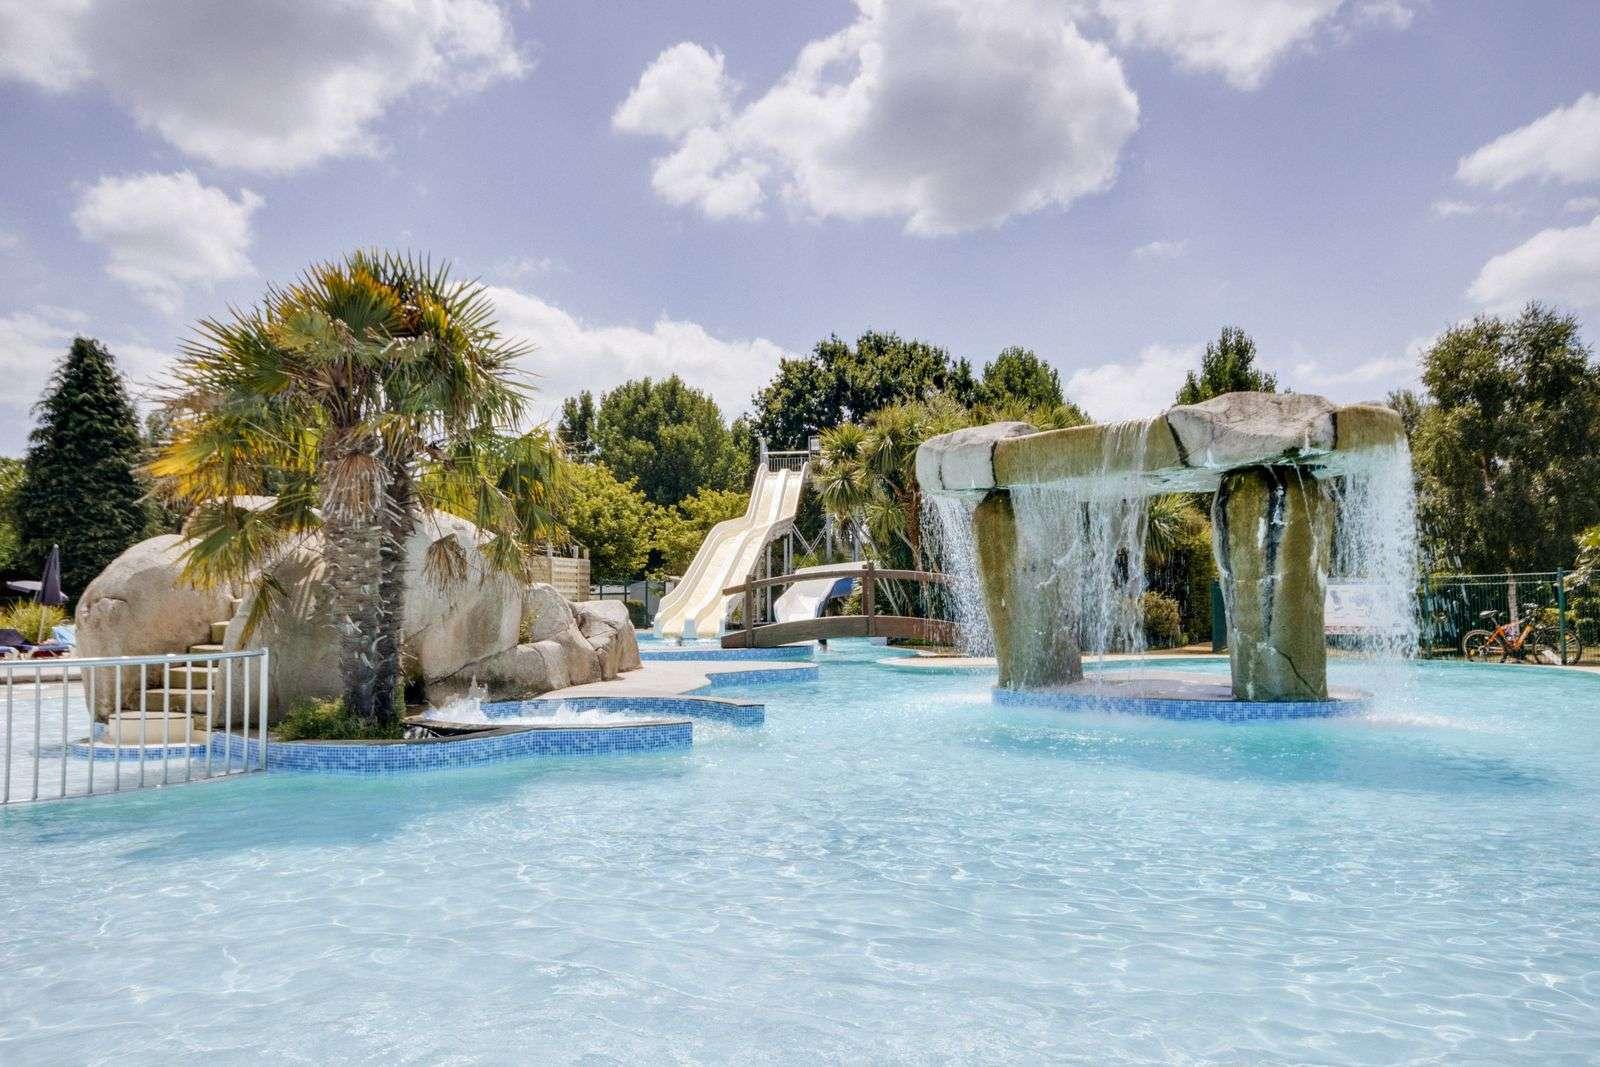 piscine_cascades_camping-coteo-carnac-rosnual_carnac